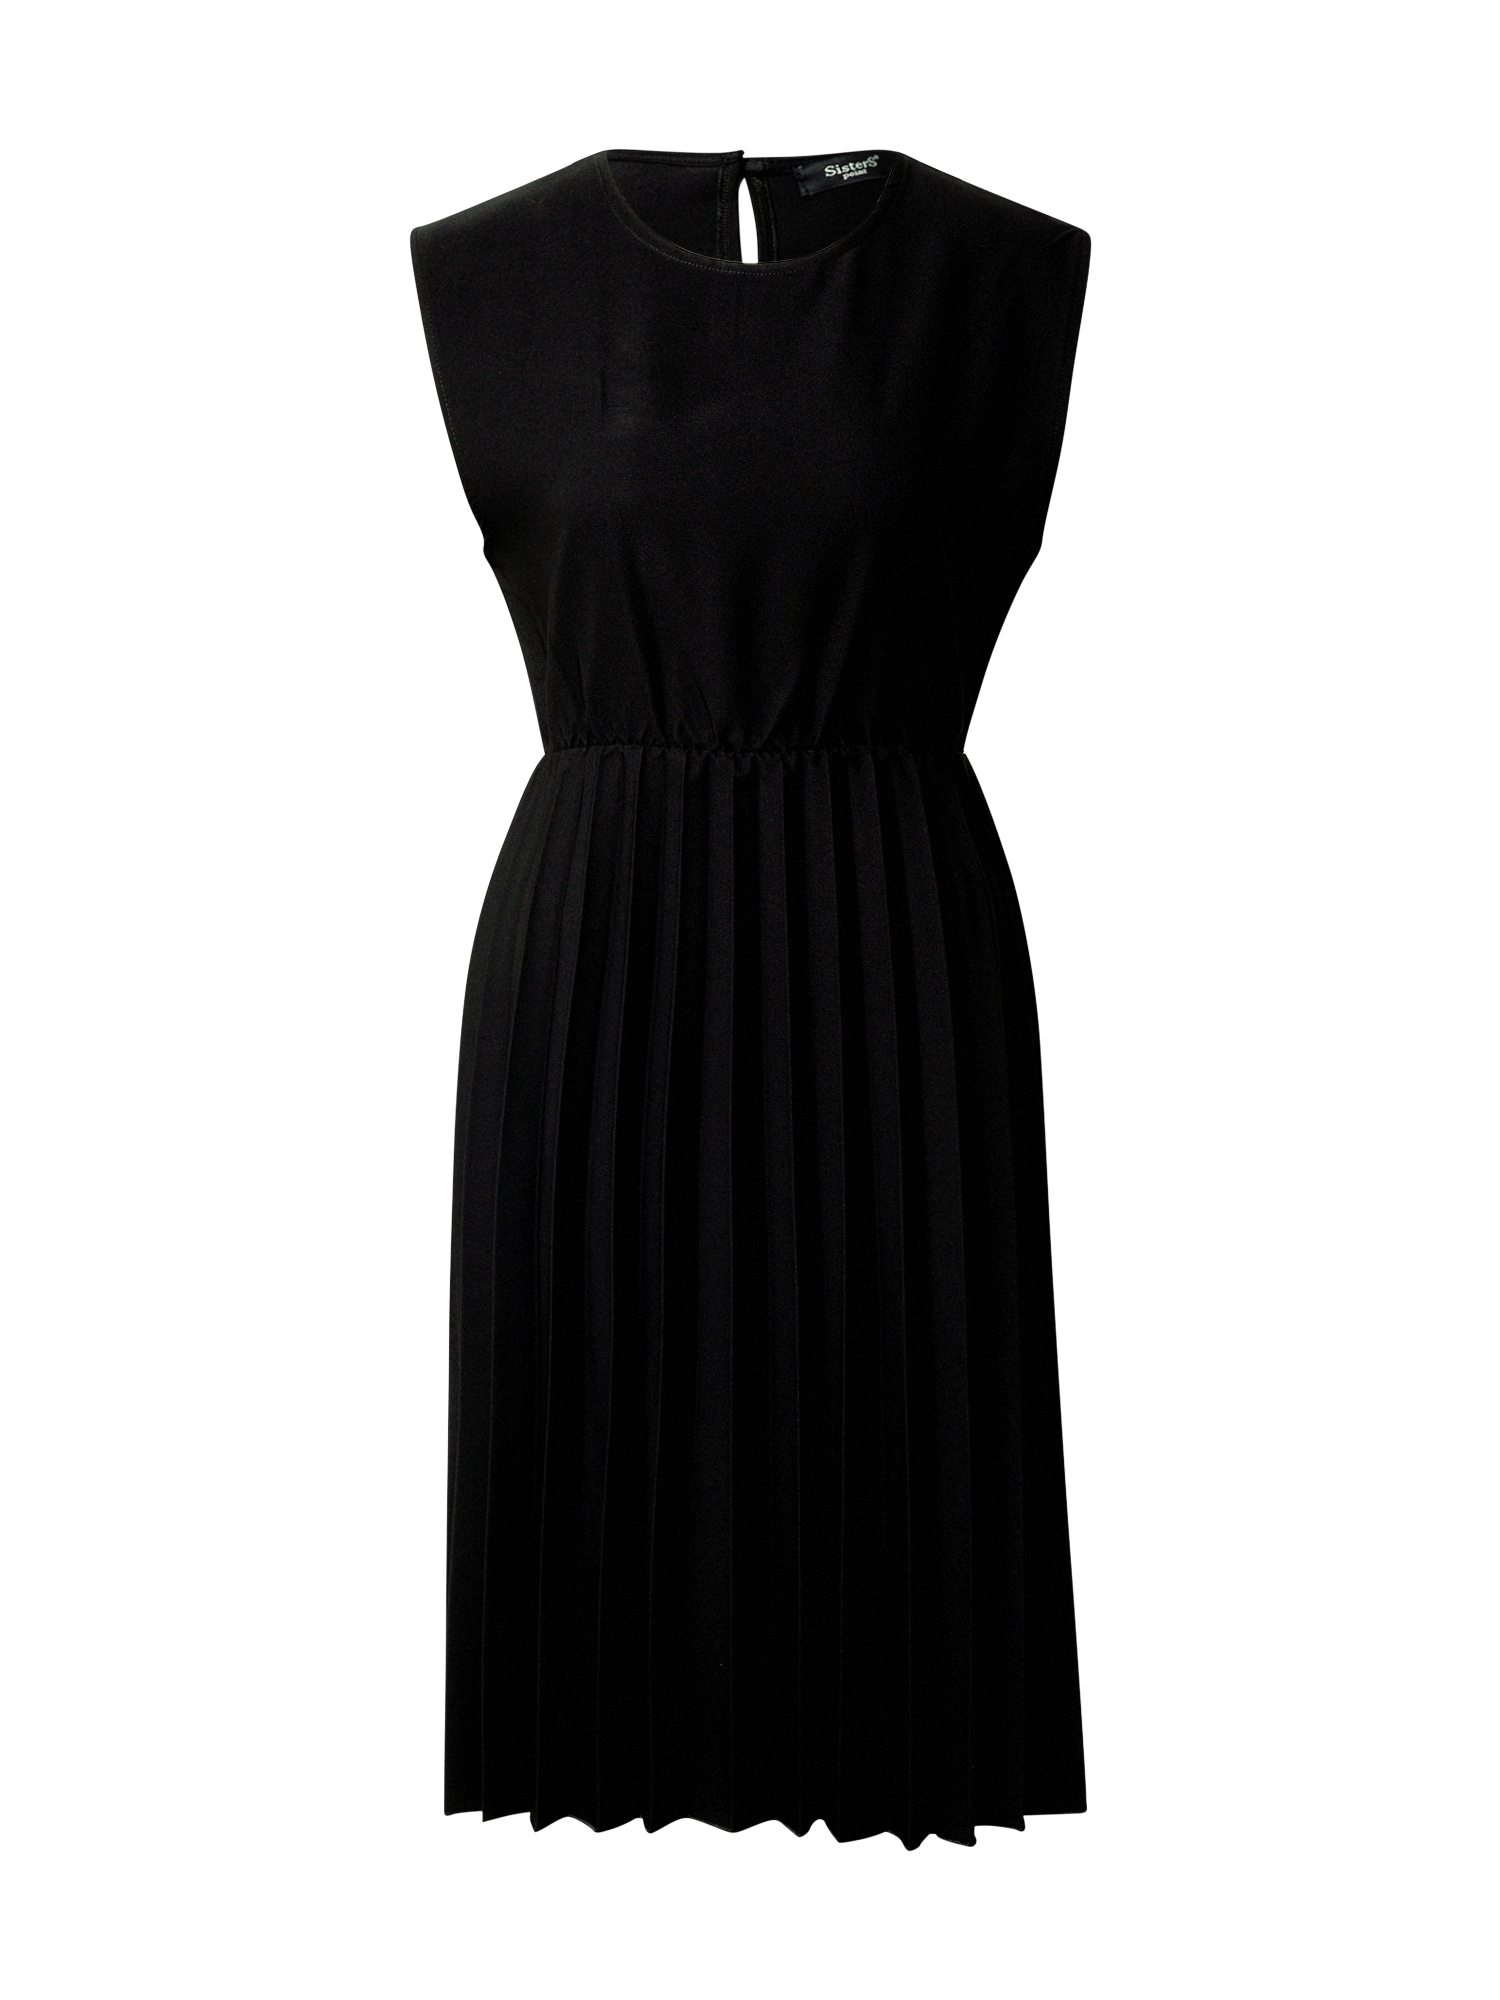 SISTERS POINT Šaty 'Evalo'  černá